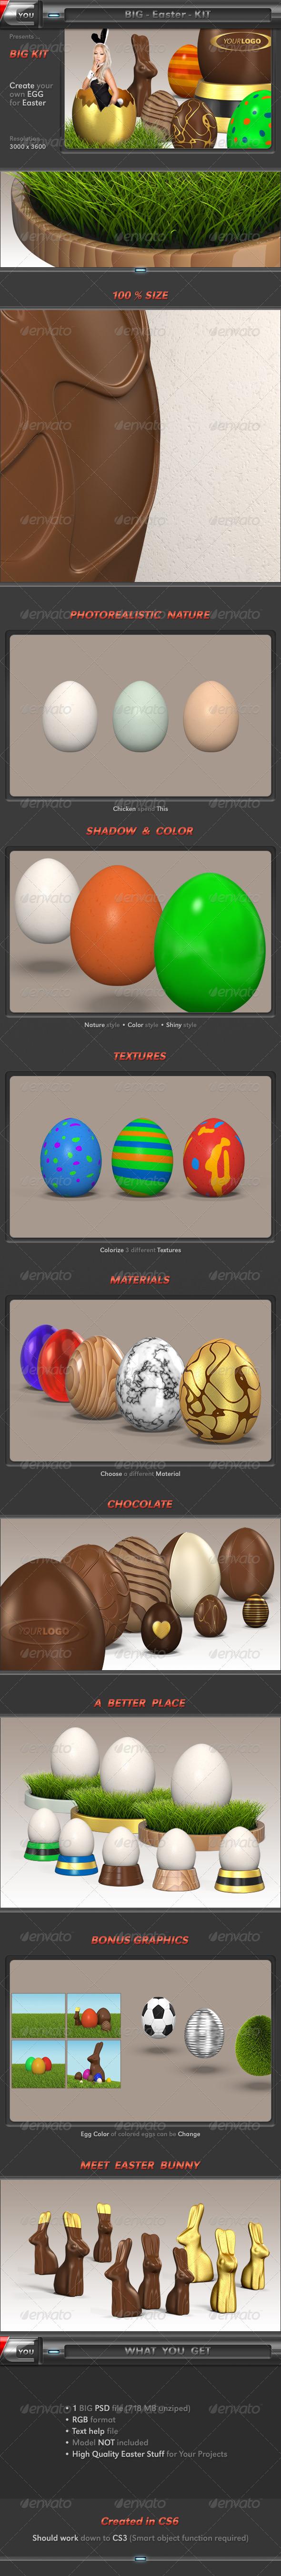 Easter Egg Kit - Objects 3D Renders